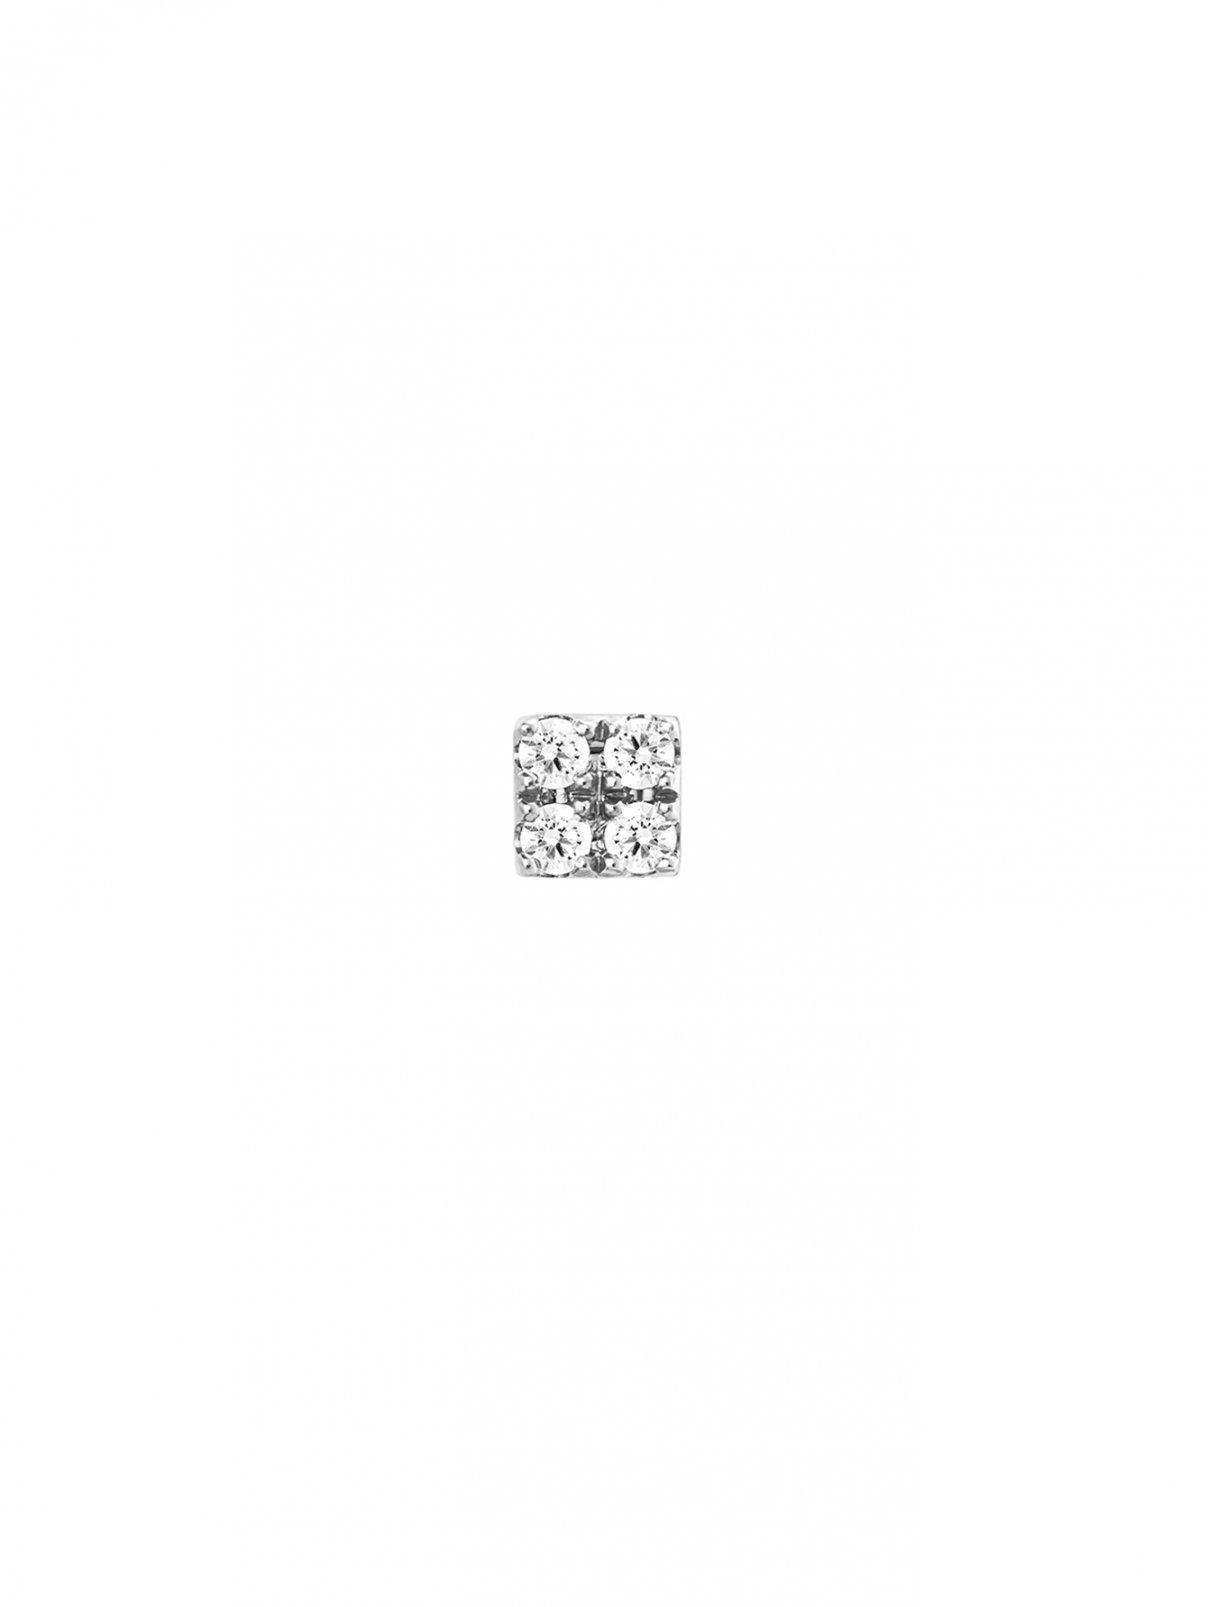 Серьги BU15541CC Ofee  –  Общий вид